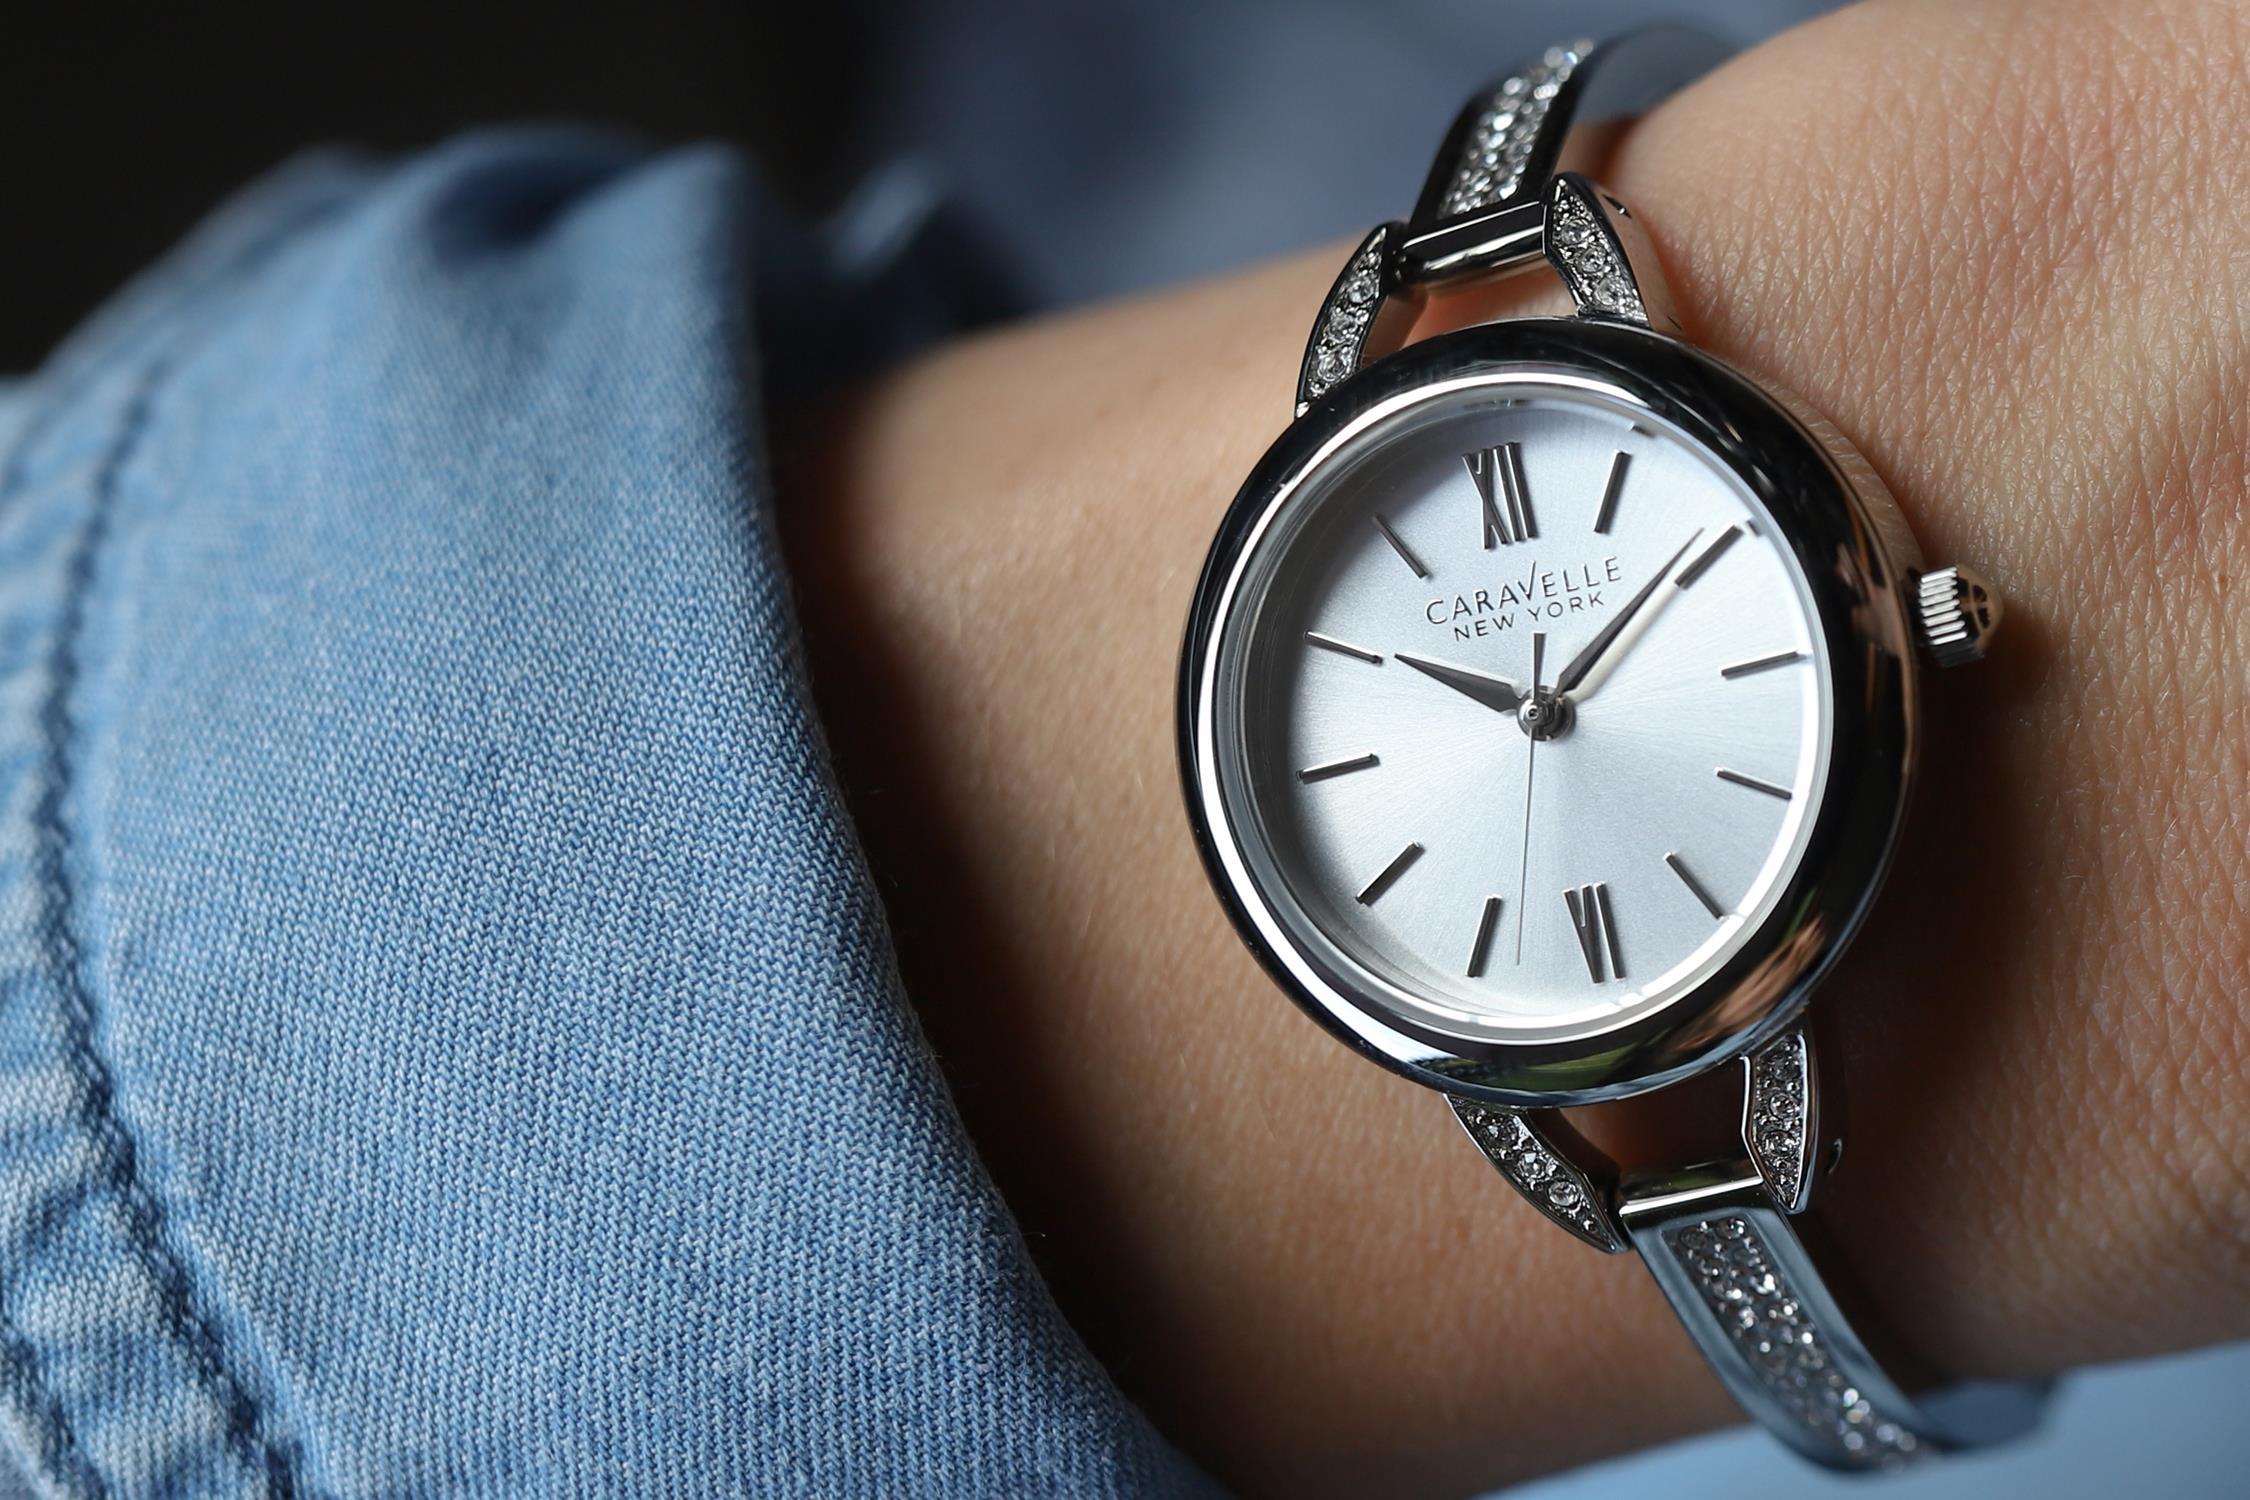 Caravelle 43L200 zegarek fashion/modowy Bransoleta